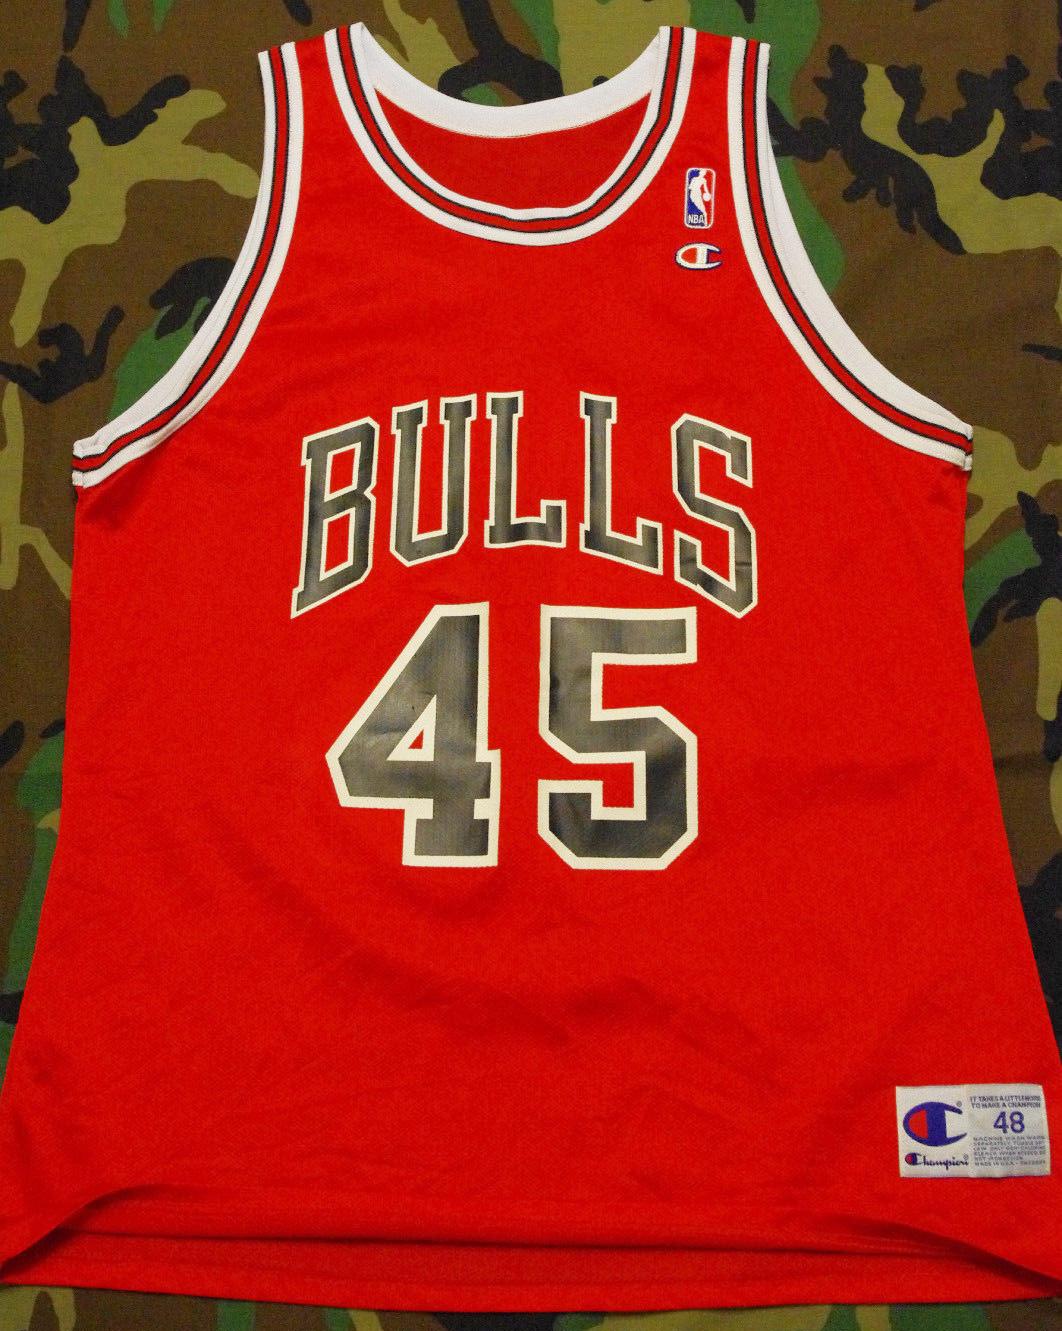 Vintage Gear: Champion Michael Jordan #45 Bulls Replica Jersey,XQAWDDY142,\\u0026quot;Air Jordan 13 CP3\\u0026quot;